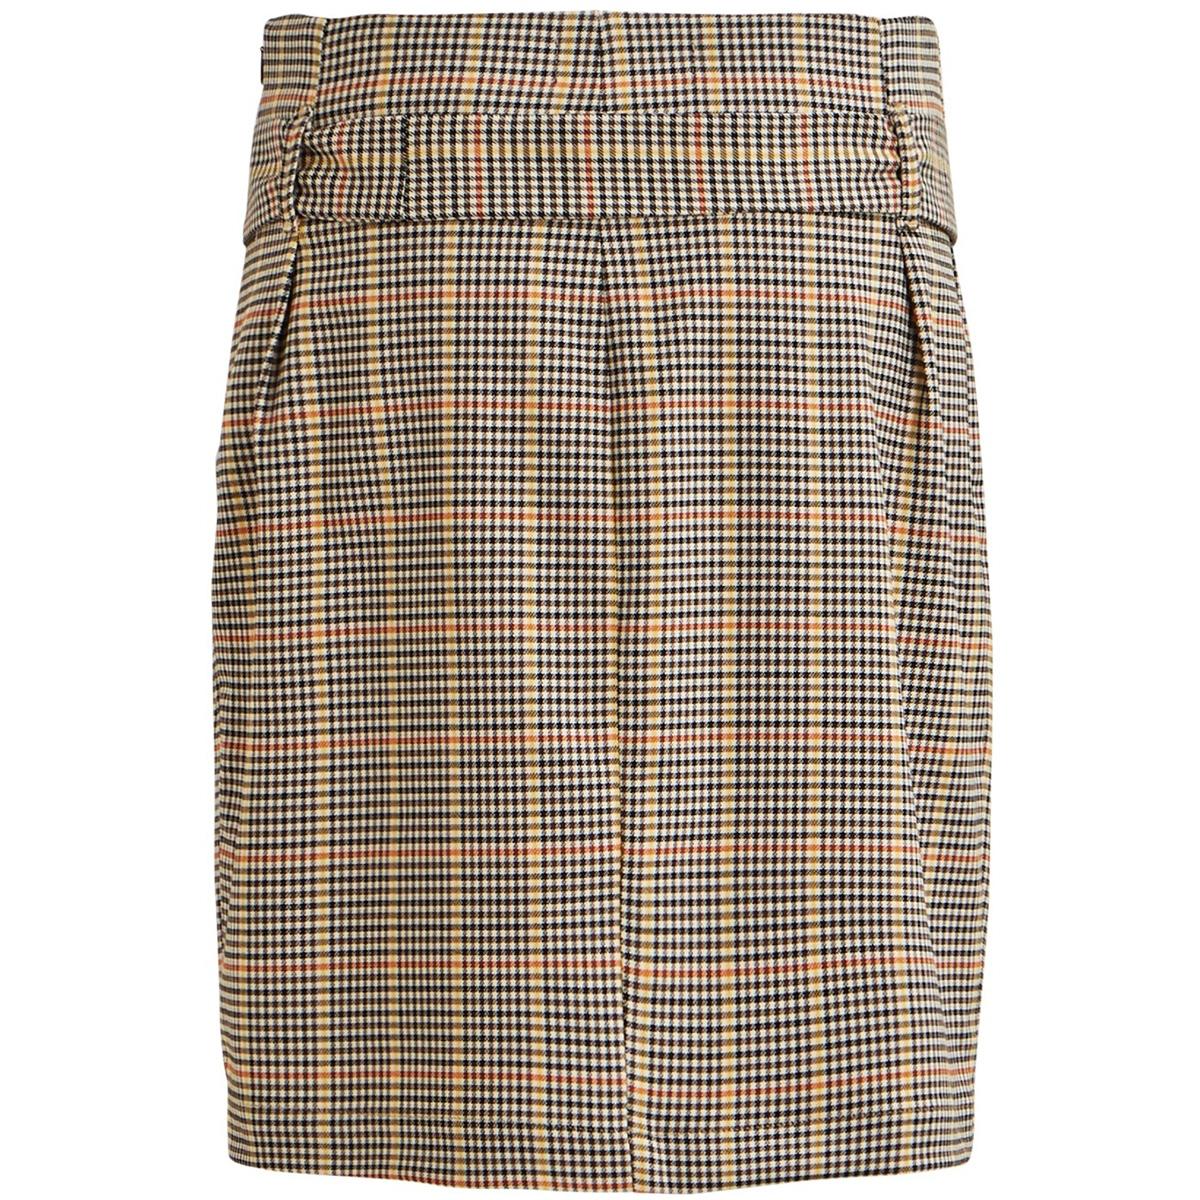 objlisa abella mini skirt seasonal 23030922 object rok brown patina/checks